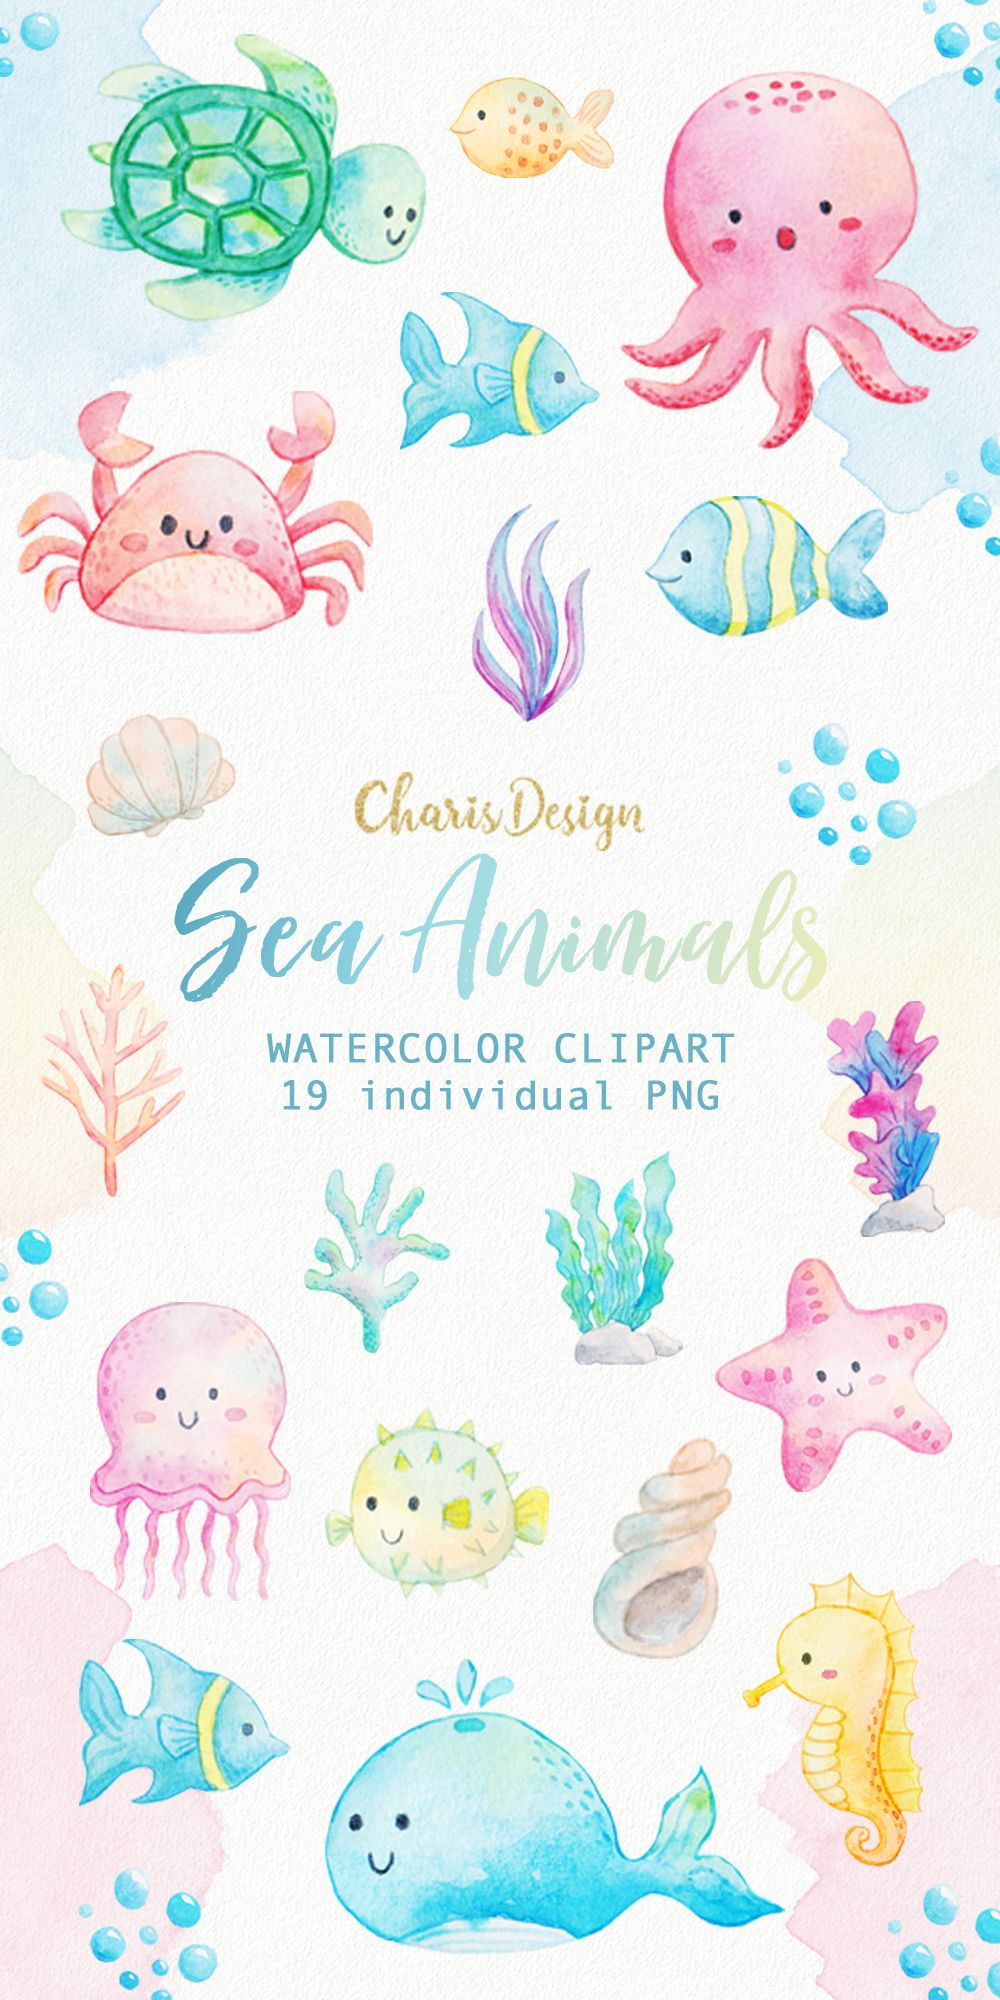 Clipart ocean watercolor. Sea animals seaweed underwater